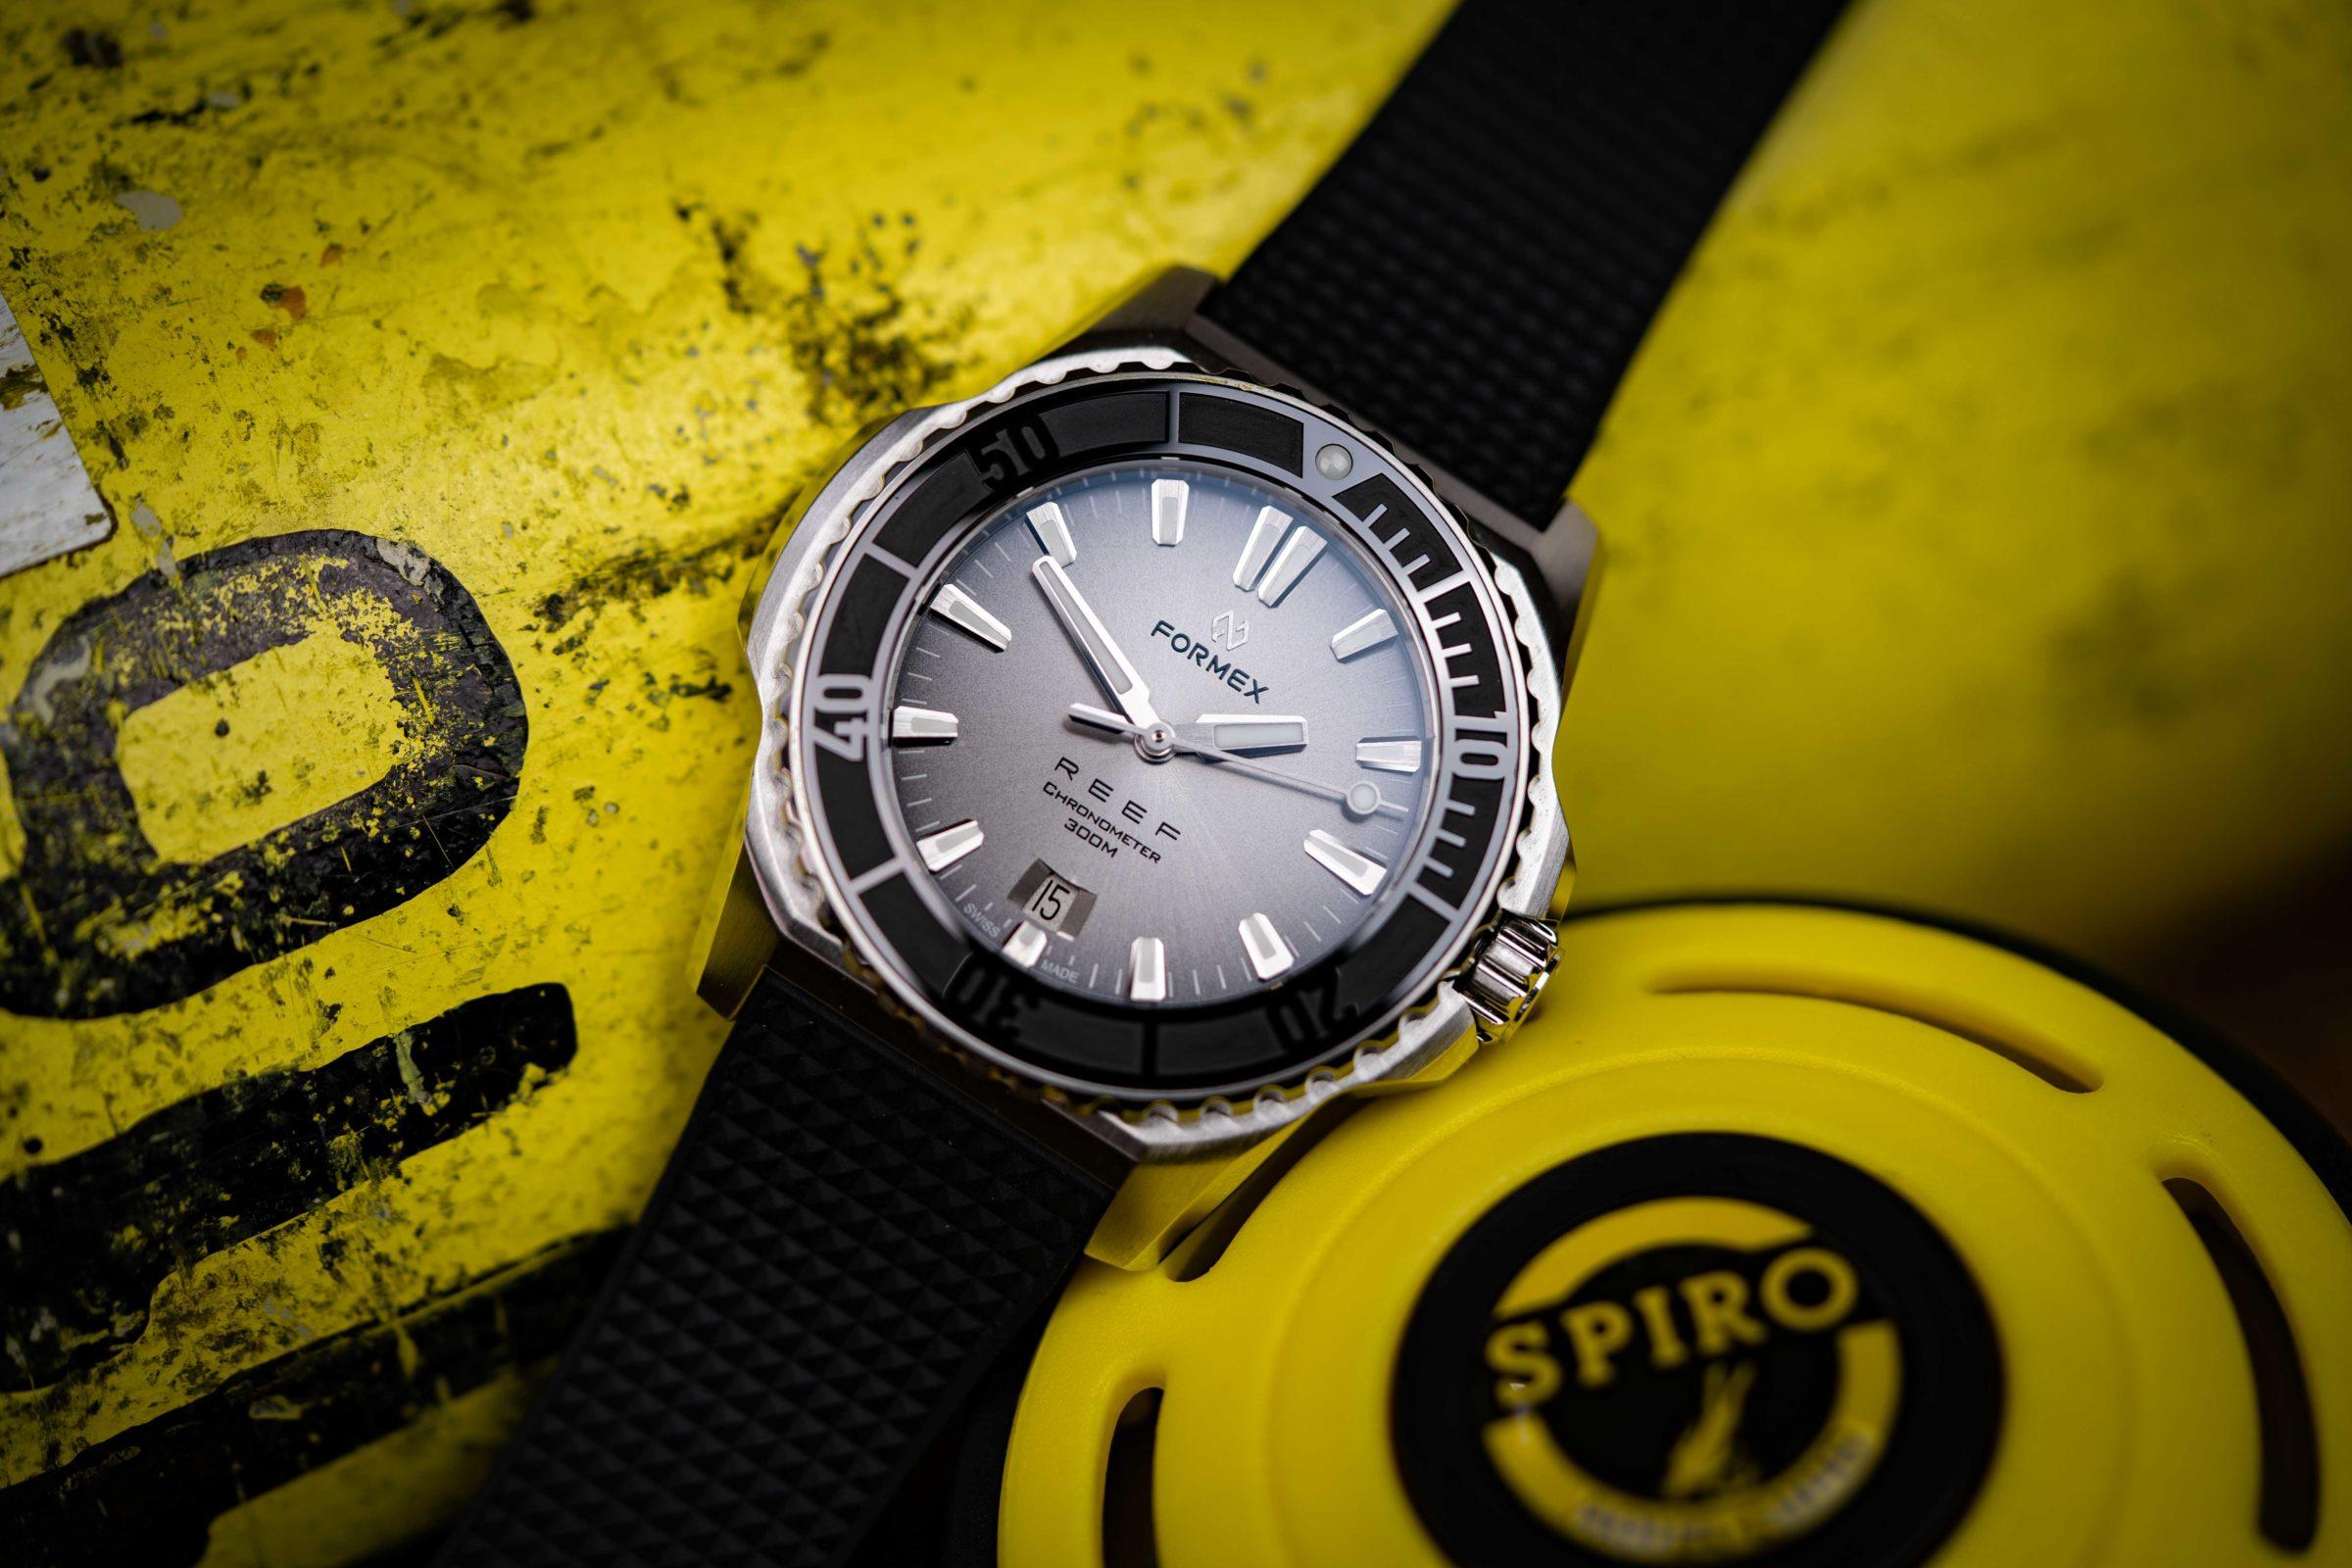 Formex-Reef-Automatik-Chronometer-300m-Taucheruhr-Test-1